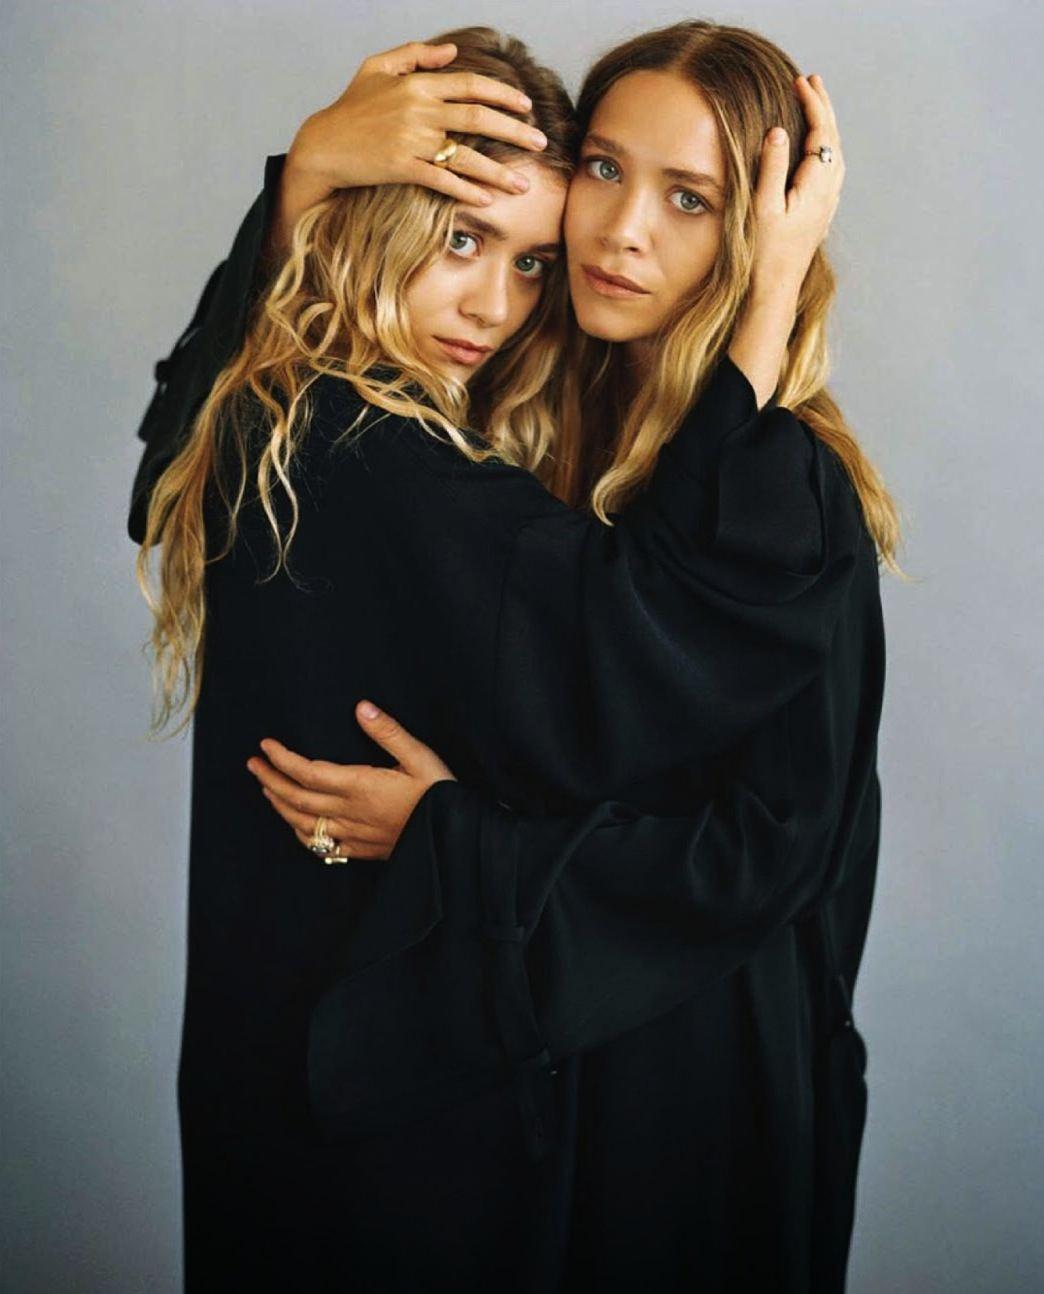 7olsen_Sisters_style_mary_kate_olsen_fabulous_muses